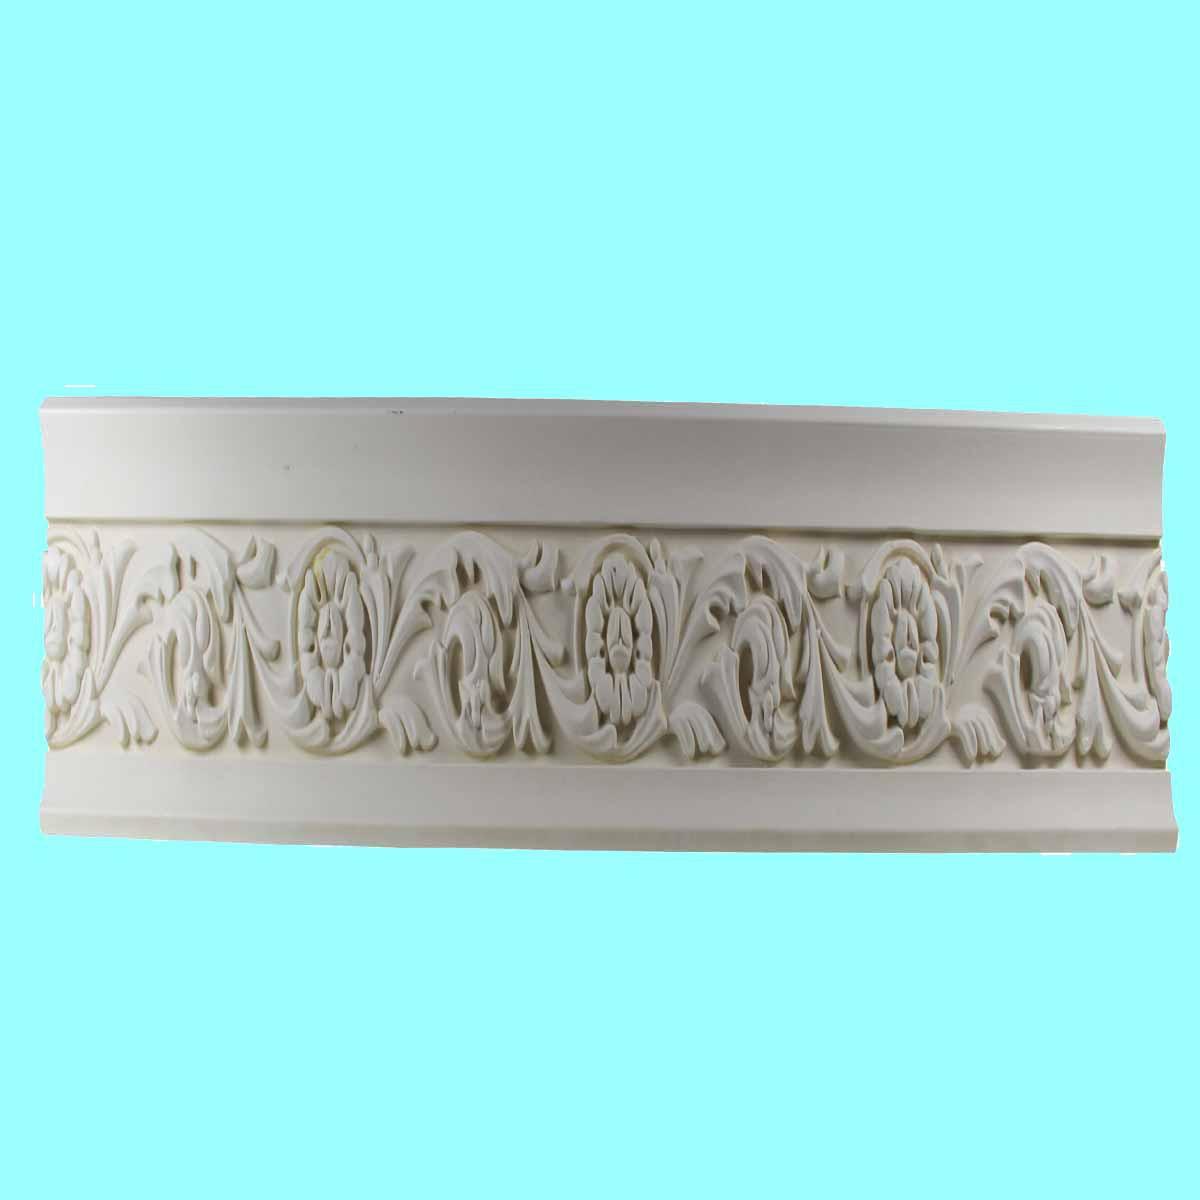 Cornice White Urethane 23.5 Sample of 11373 Cornice Cornice Moulding Cornice Molding